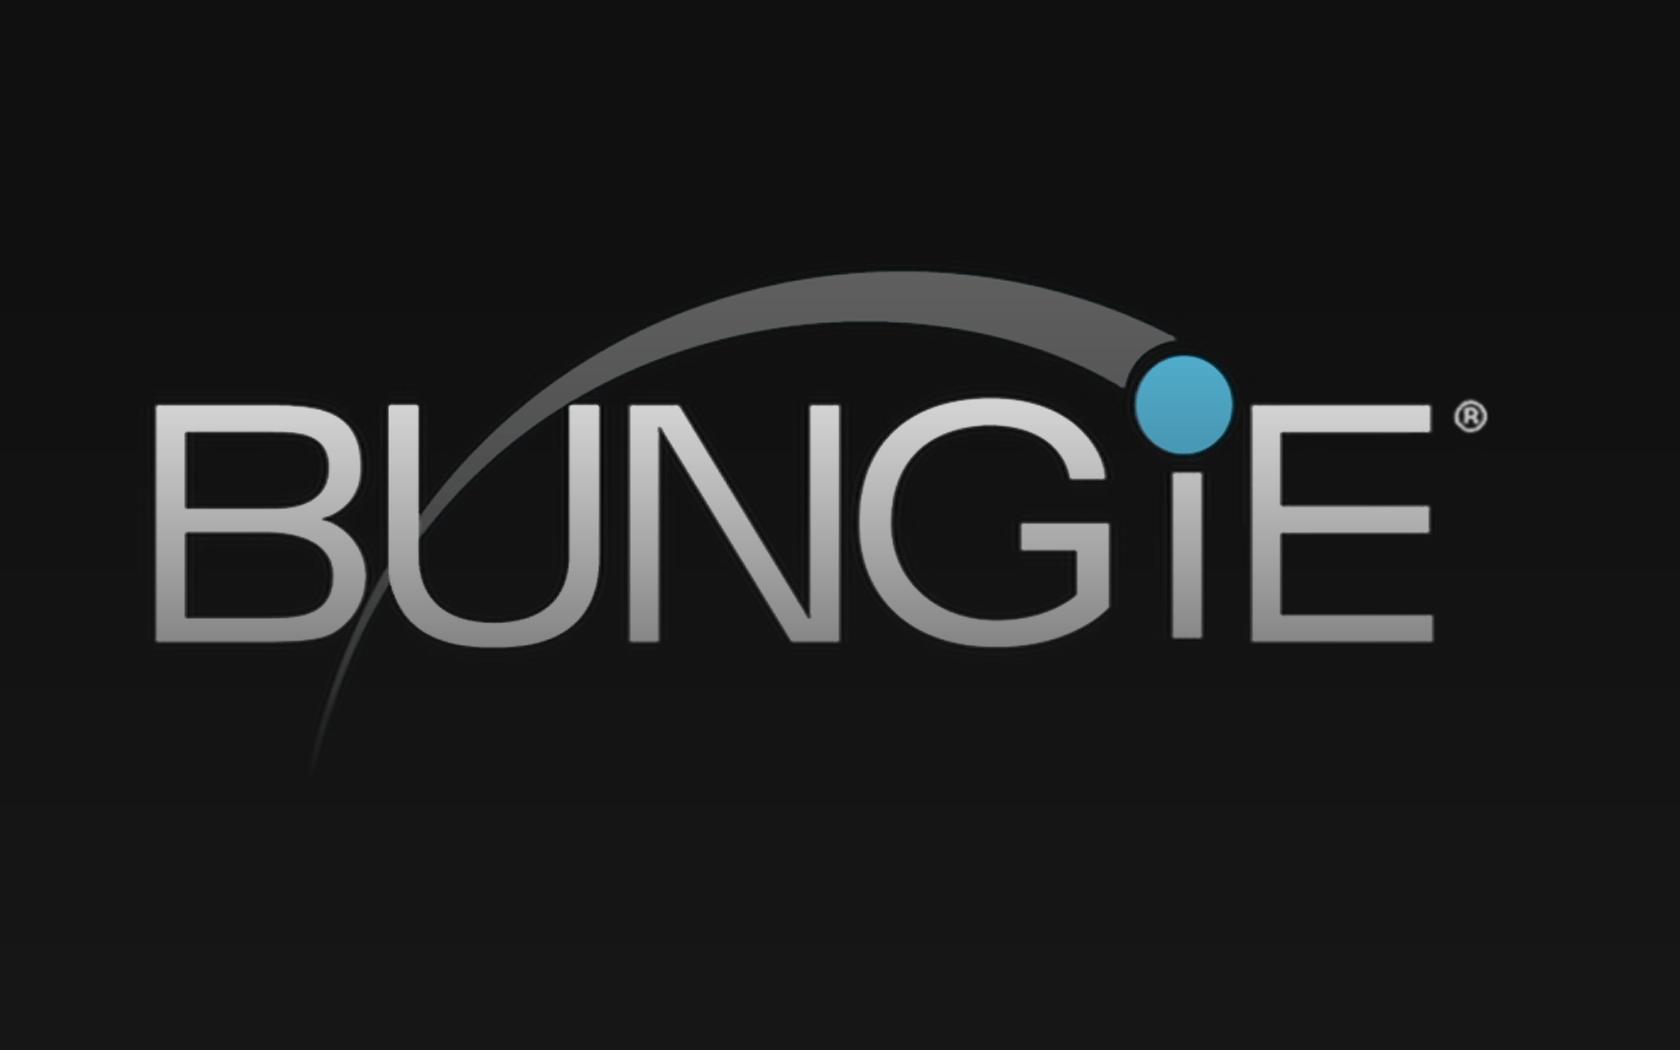 Destiny Bungie Wallpaper HD, Awesome 48 Destiny Bungie HD ...